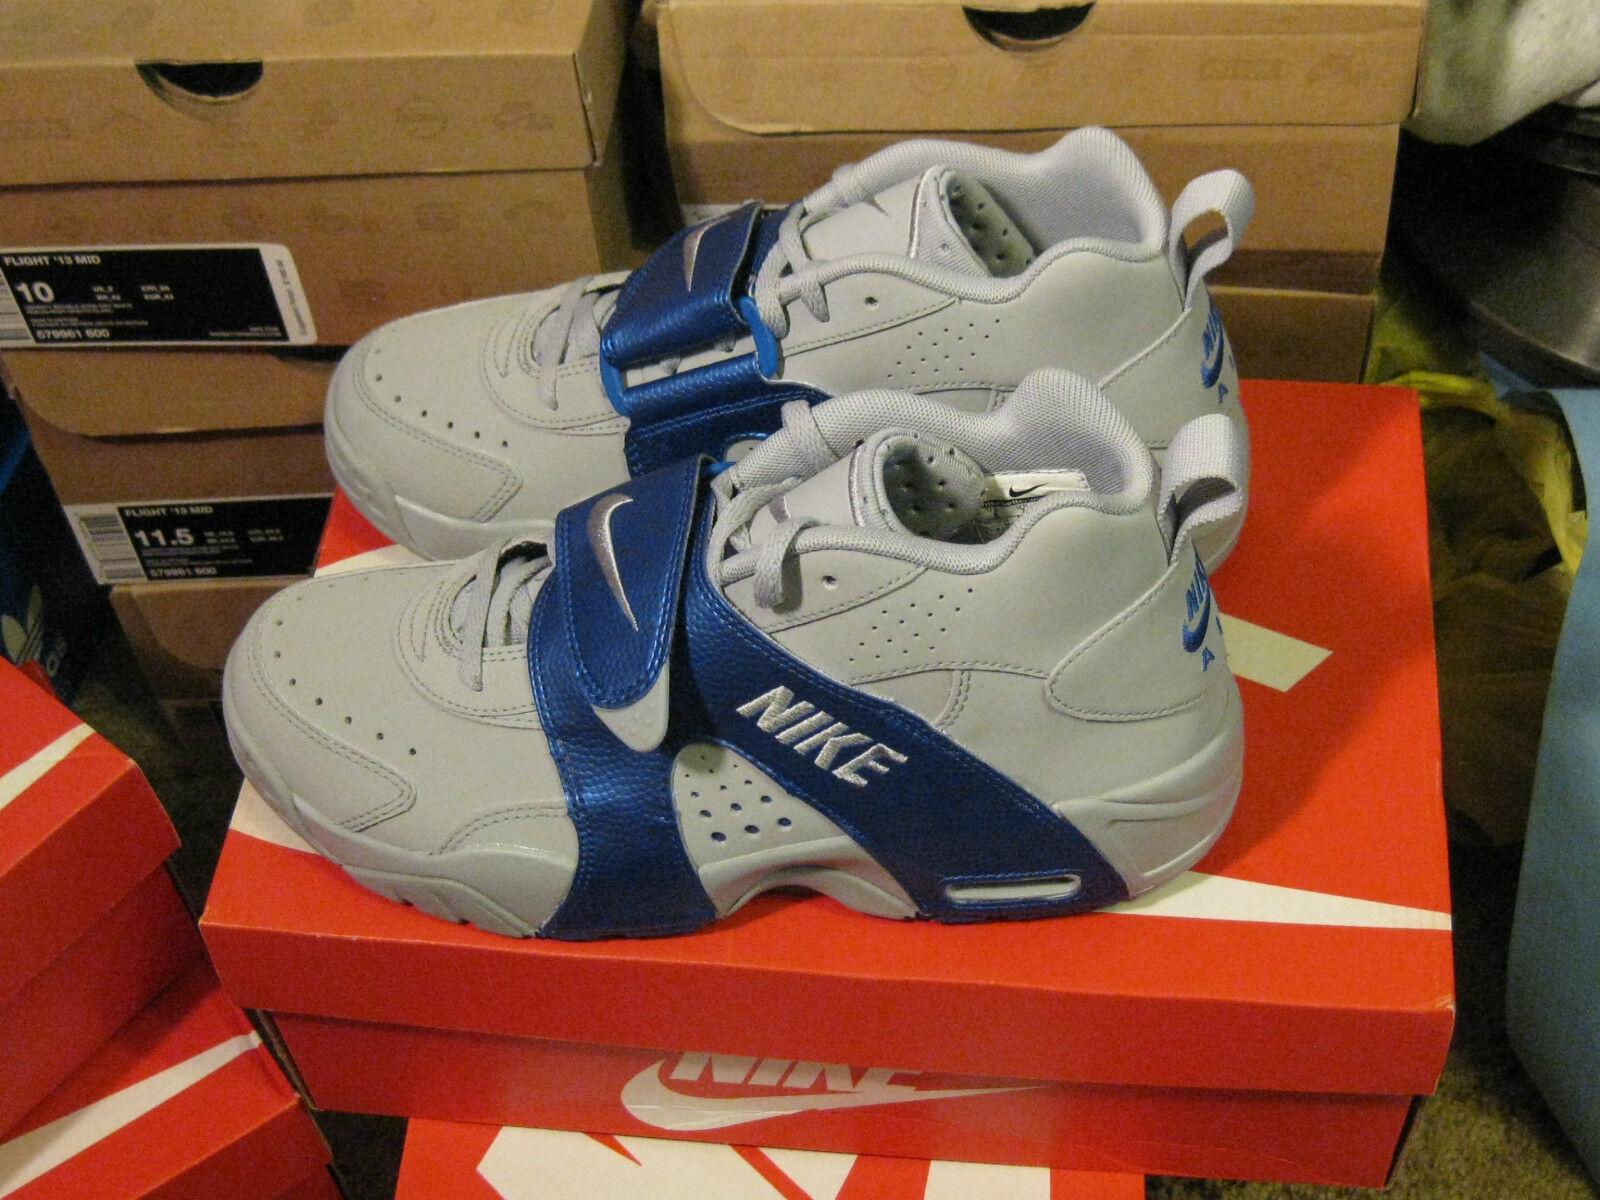 Nike veer zapatos caballero 599442 us 003 us 599442 10 9 8 Nuevo 8eb67f